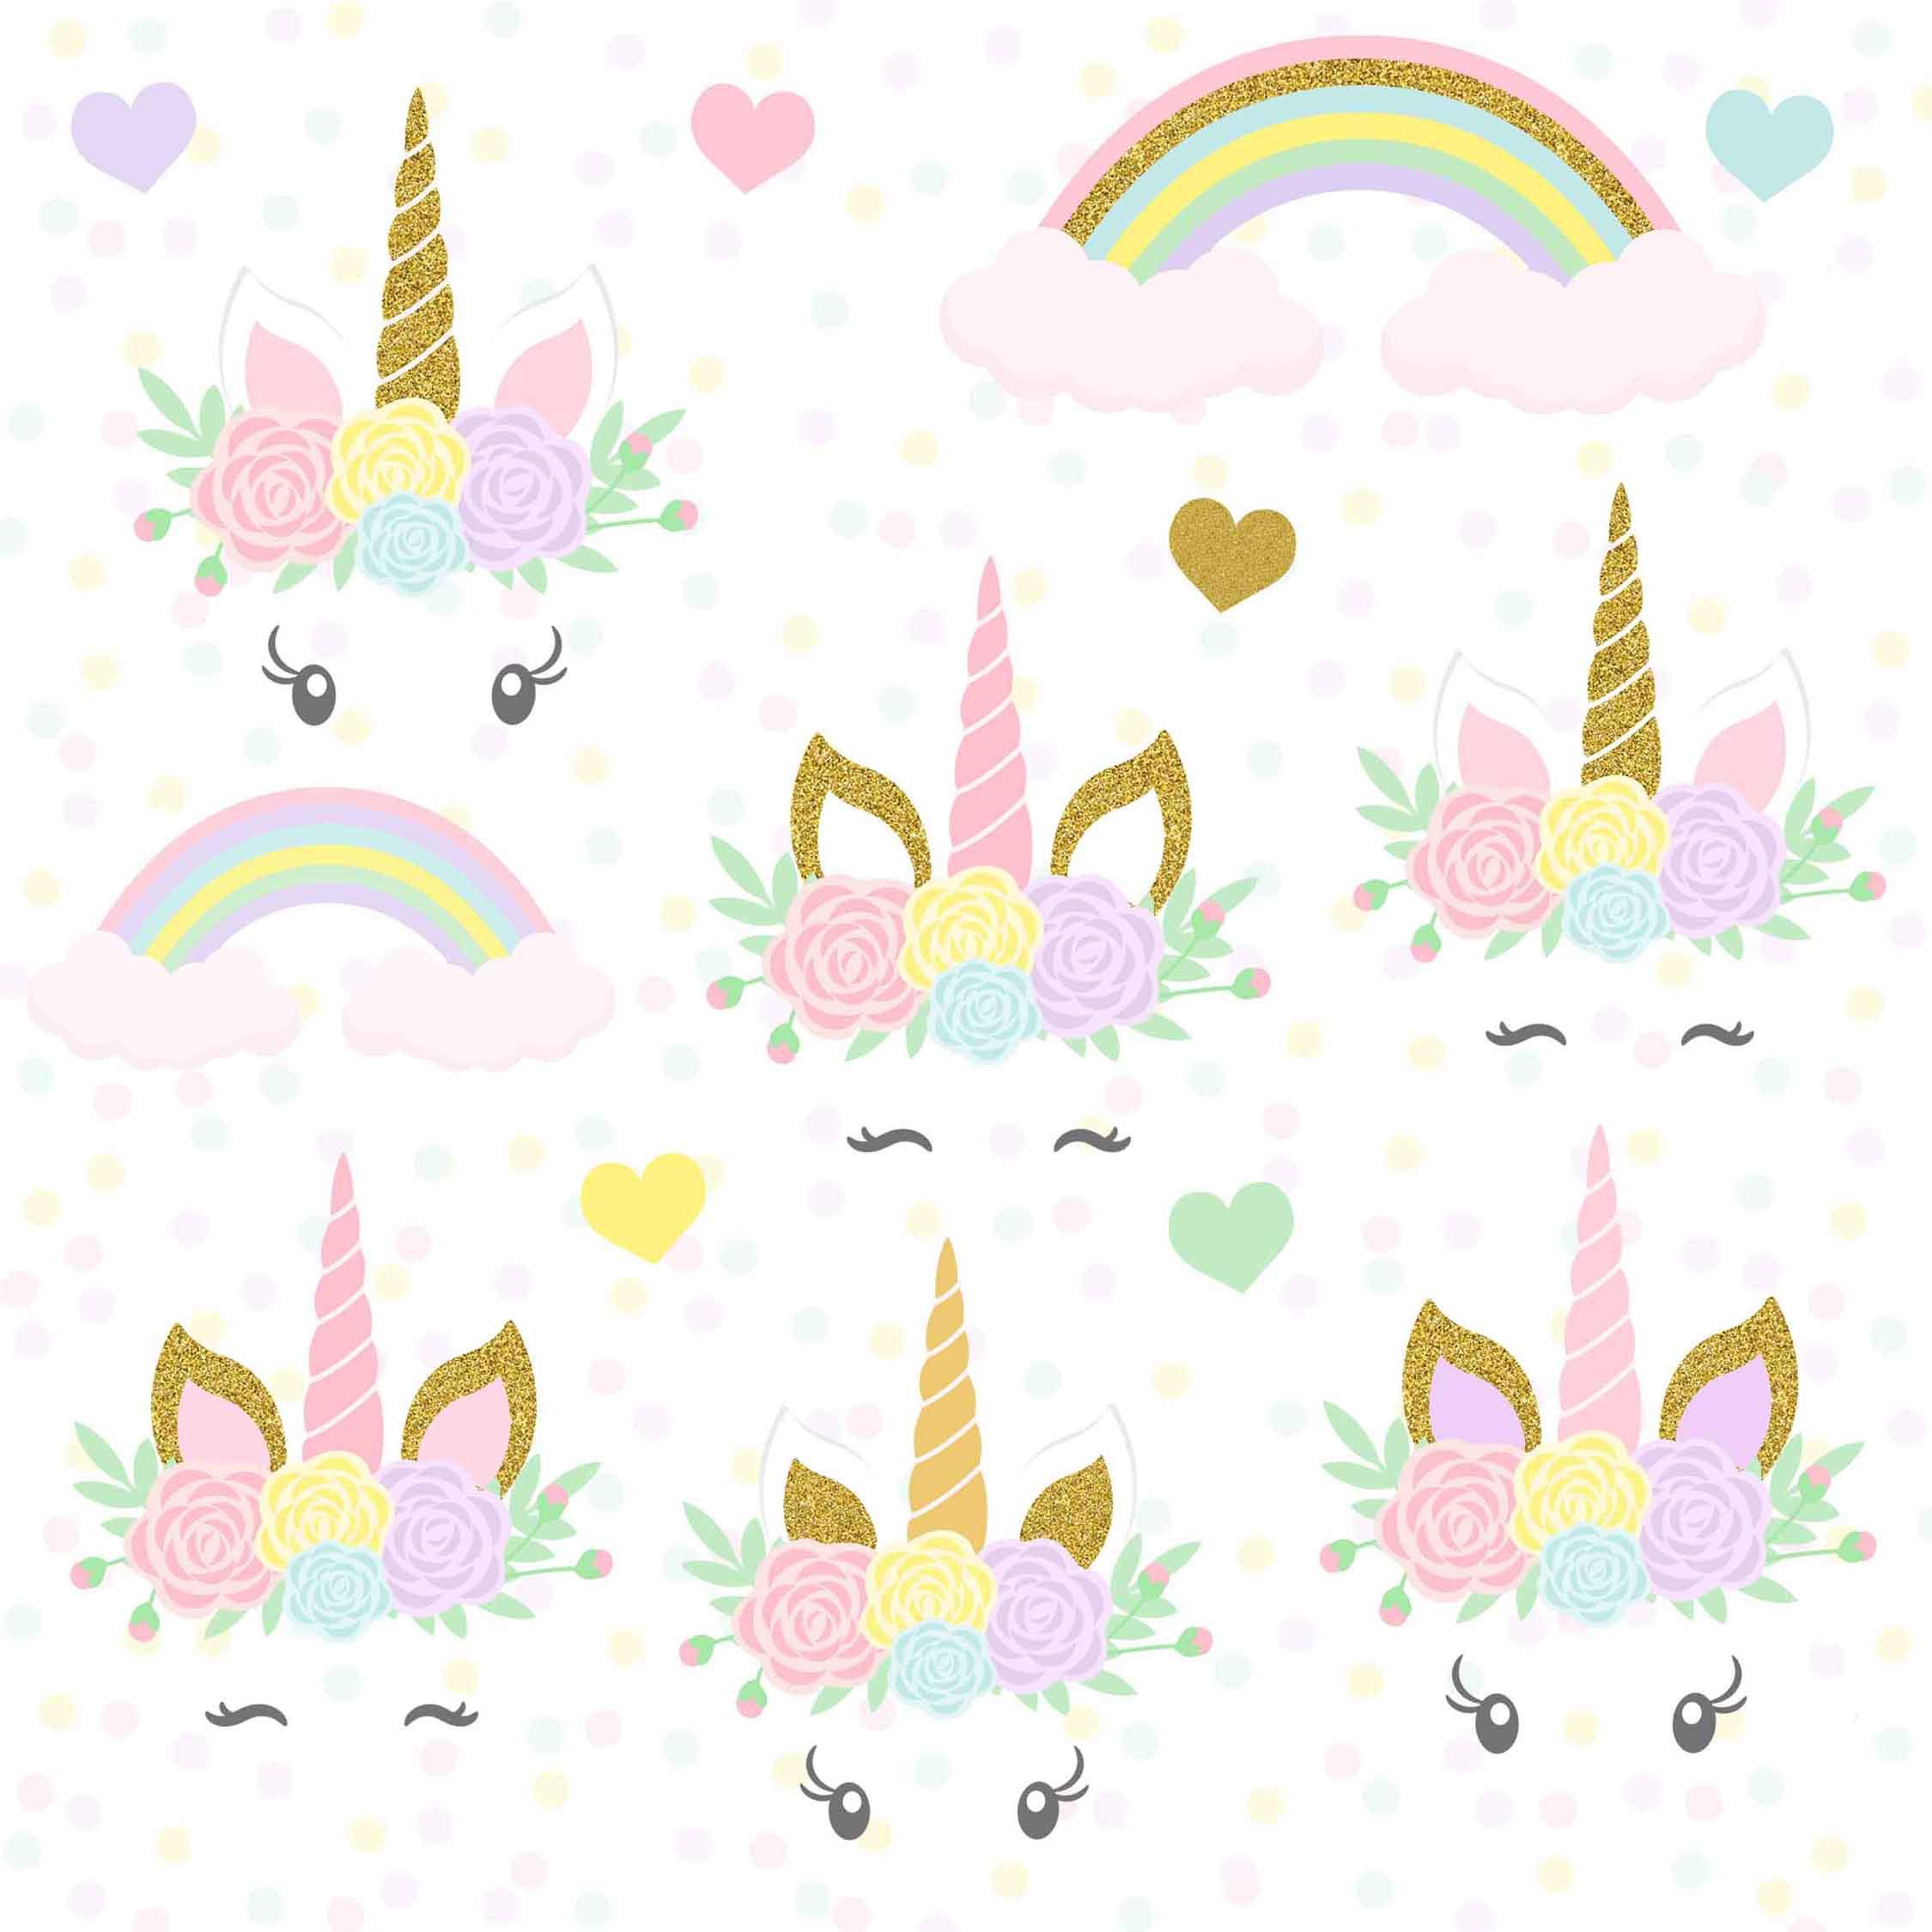 Unicorns clipart, Gold Glitter Unicorns, Unicorn head, Unicorn scrapbook,  Unicorn clipart, Rainbow clipart, Unicorn Digital Paper Pack.